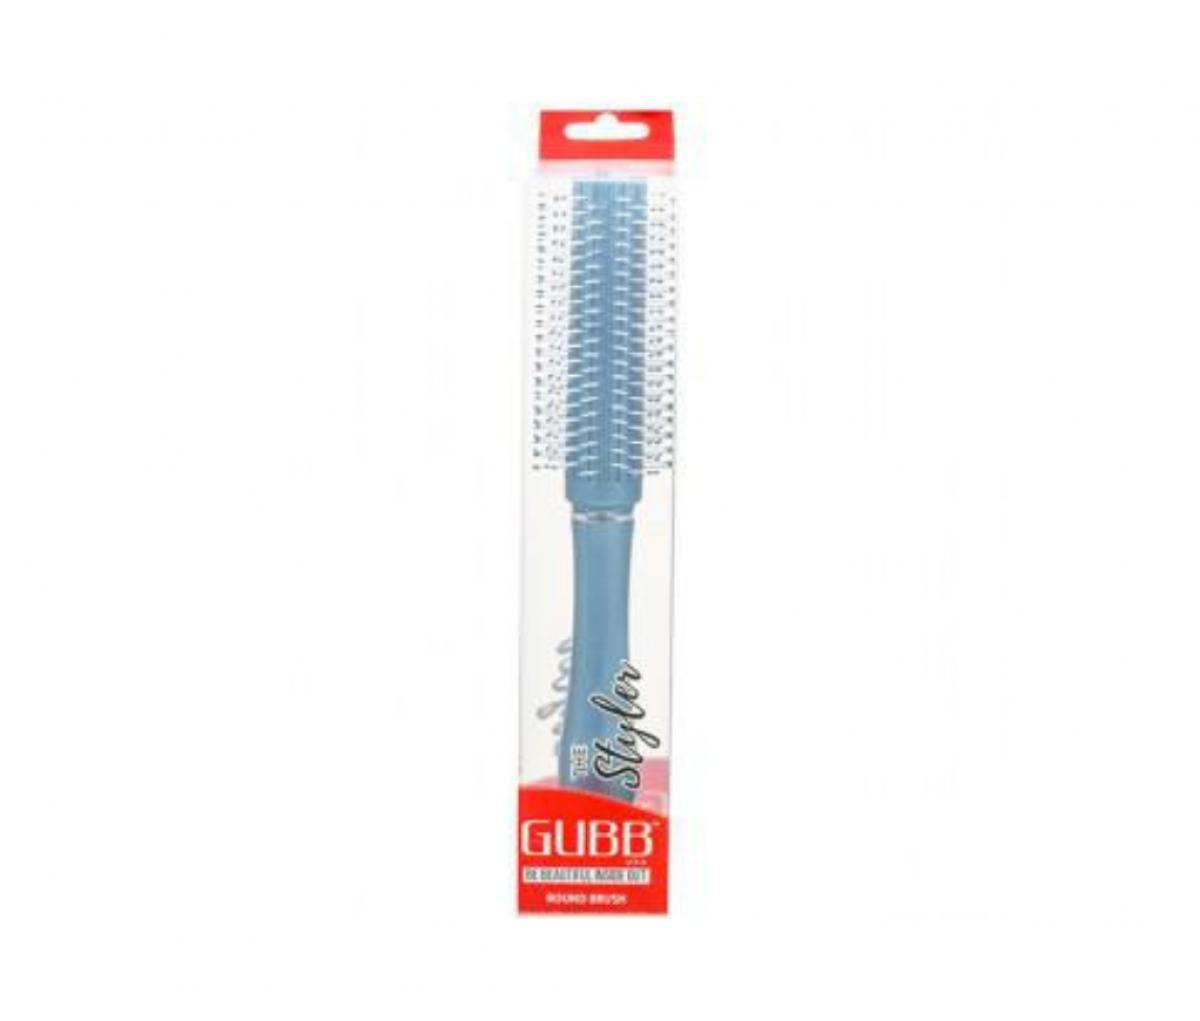 GUBB Round Brush (Styler)